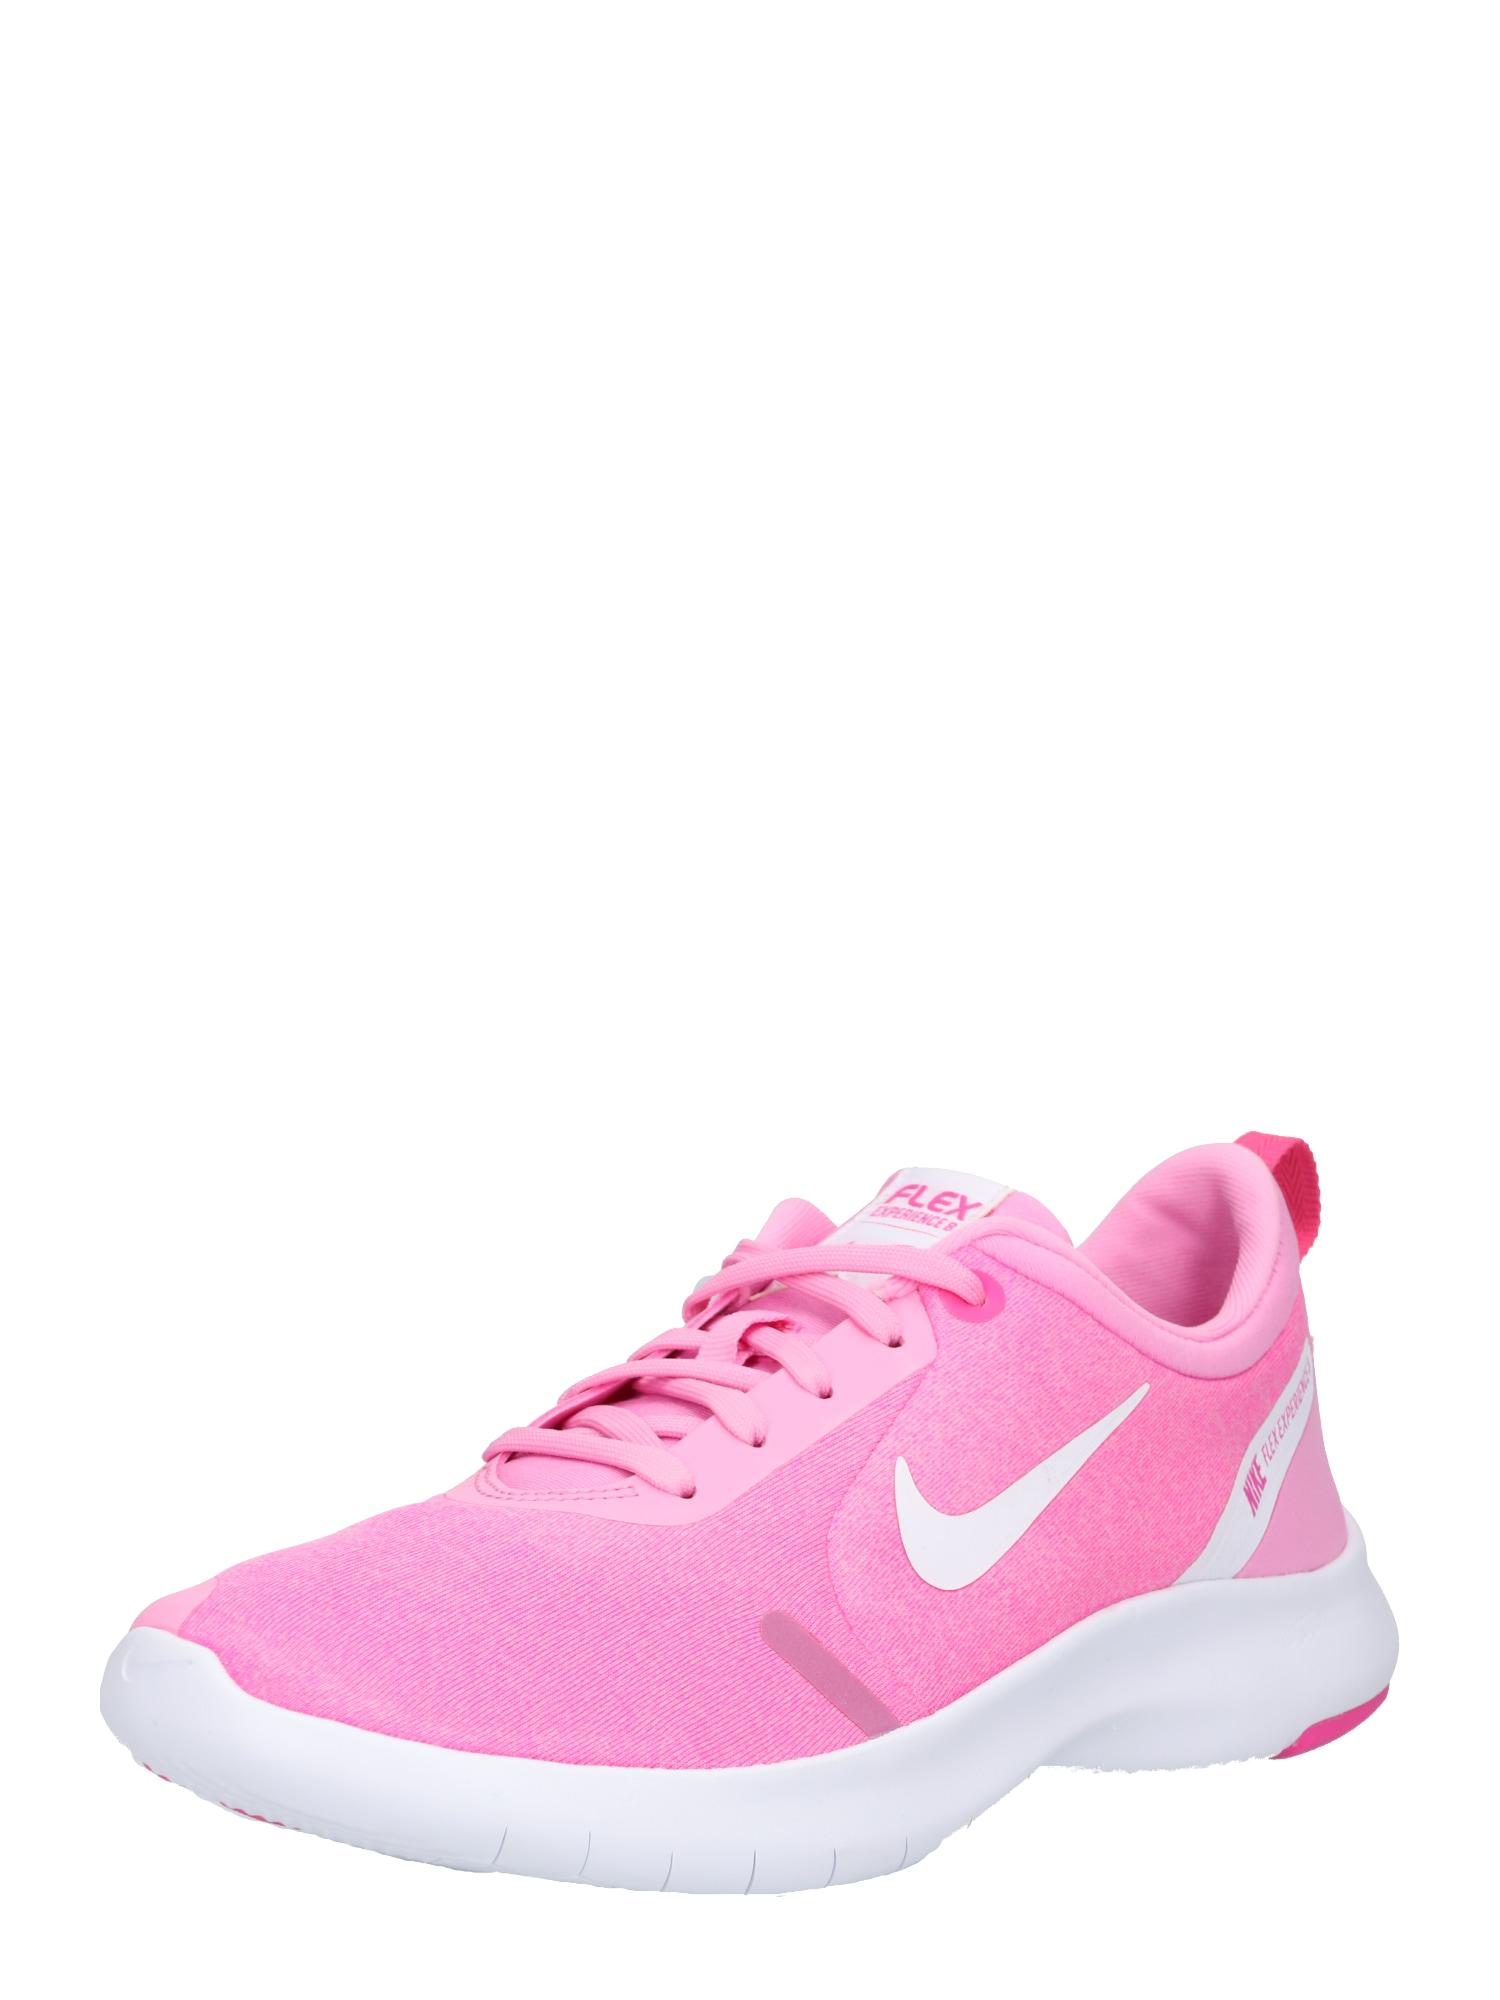 Sportovní boty Nike Flex Experience RN 8 pink bílá NIKE